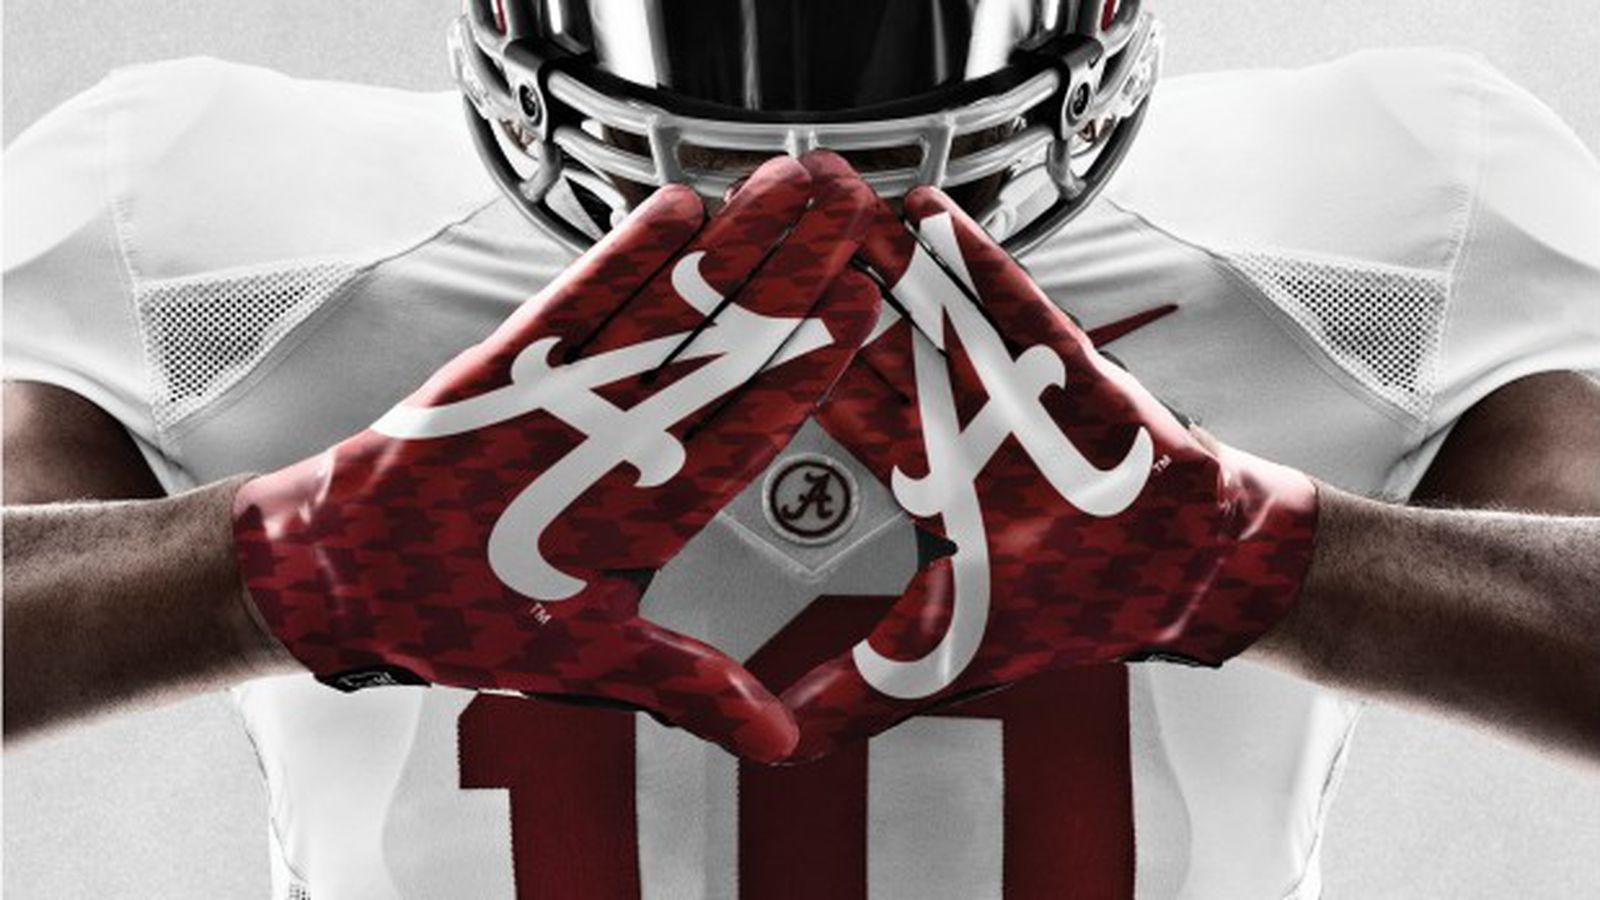 Alabama S 2013 Bcs National Championship Uniforms Are